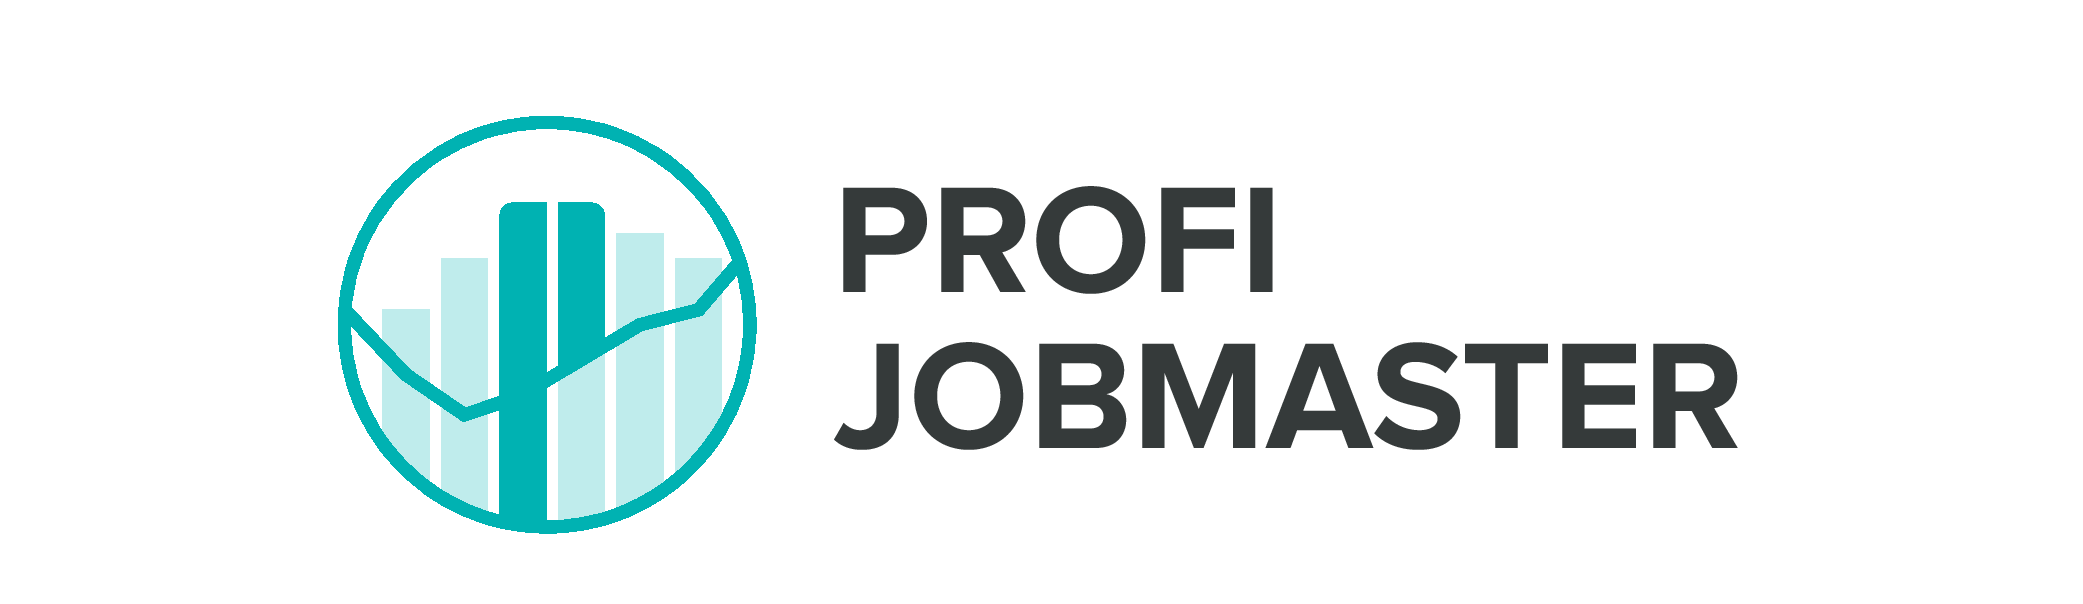 PROFI JOB MASTER